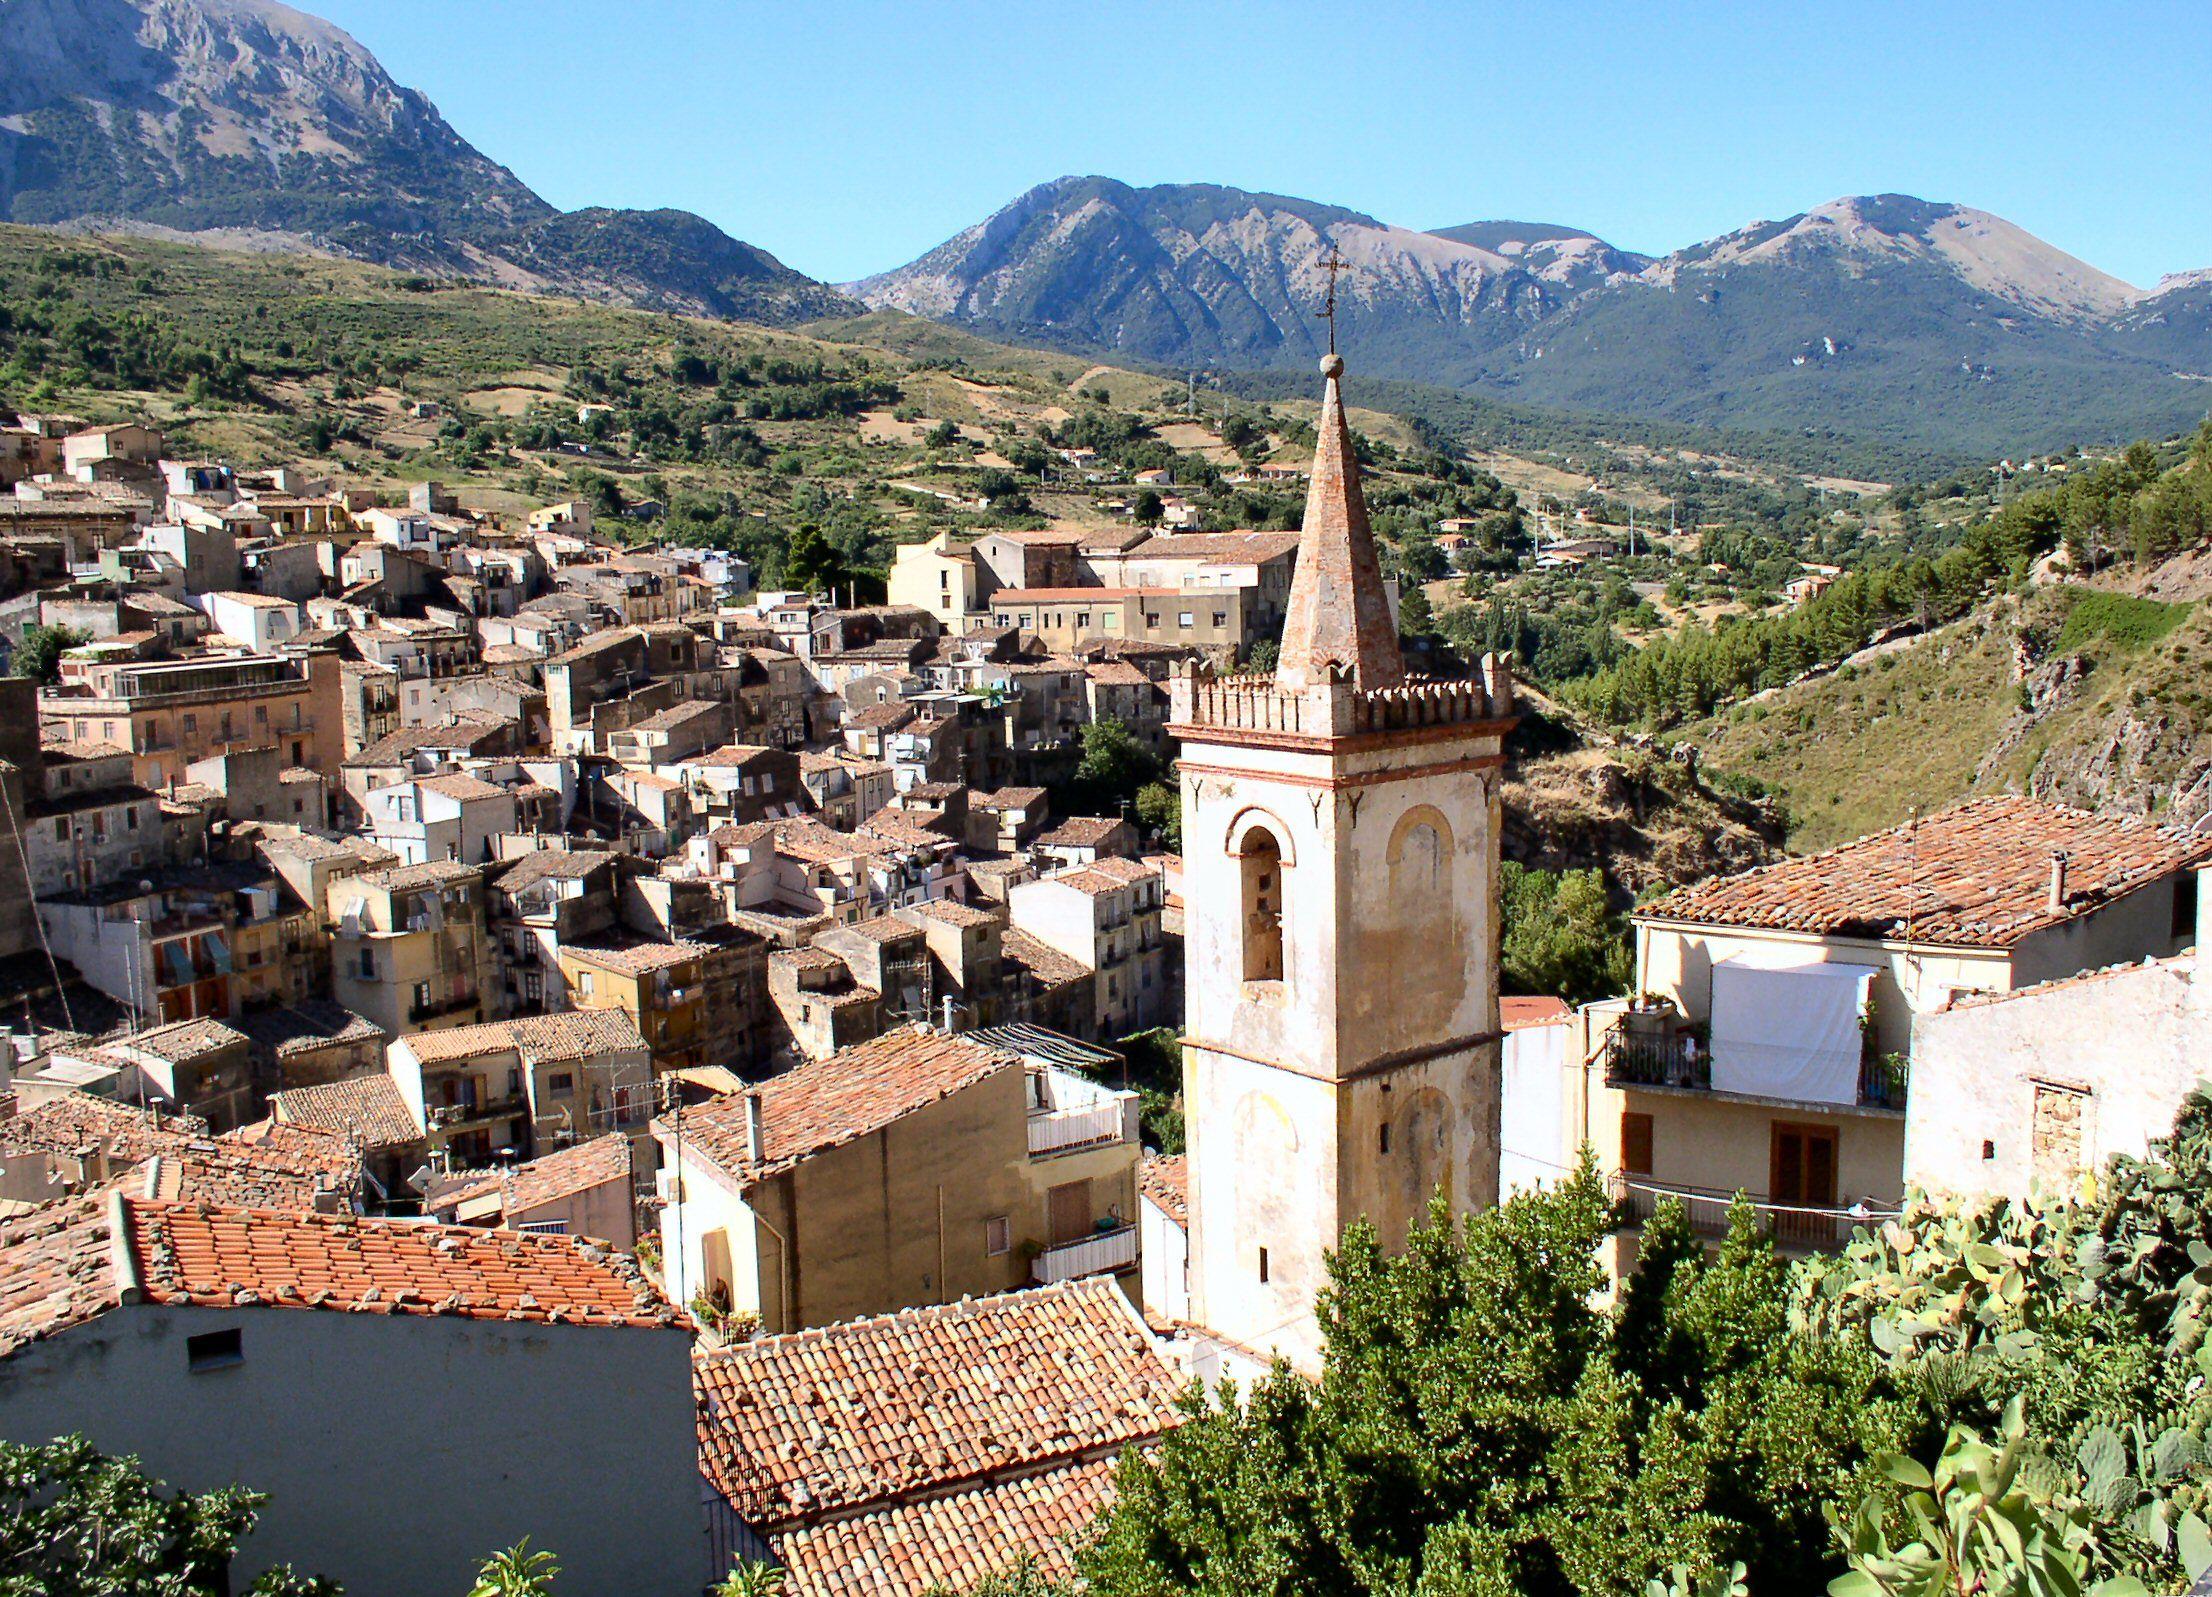 Isnello, Sicily in the Palermo (capital) province where my